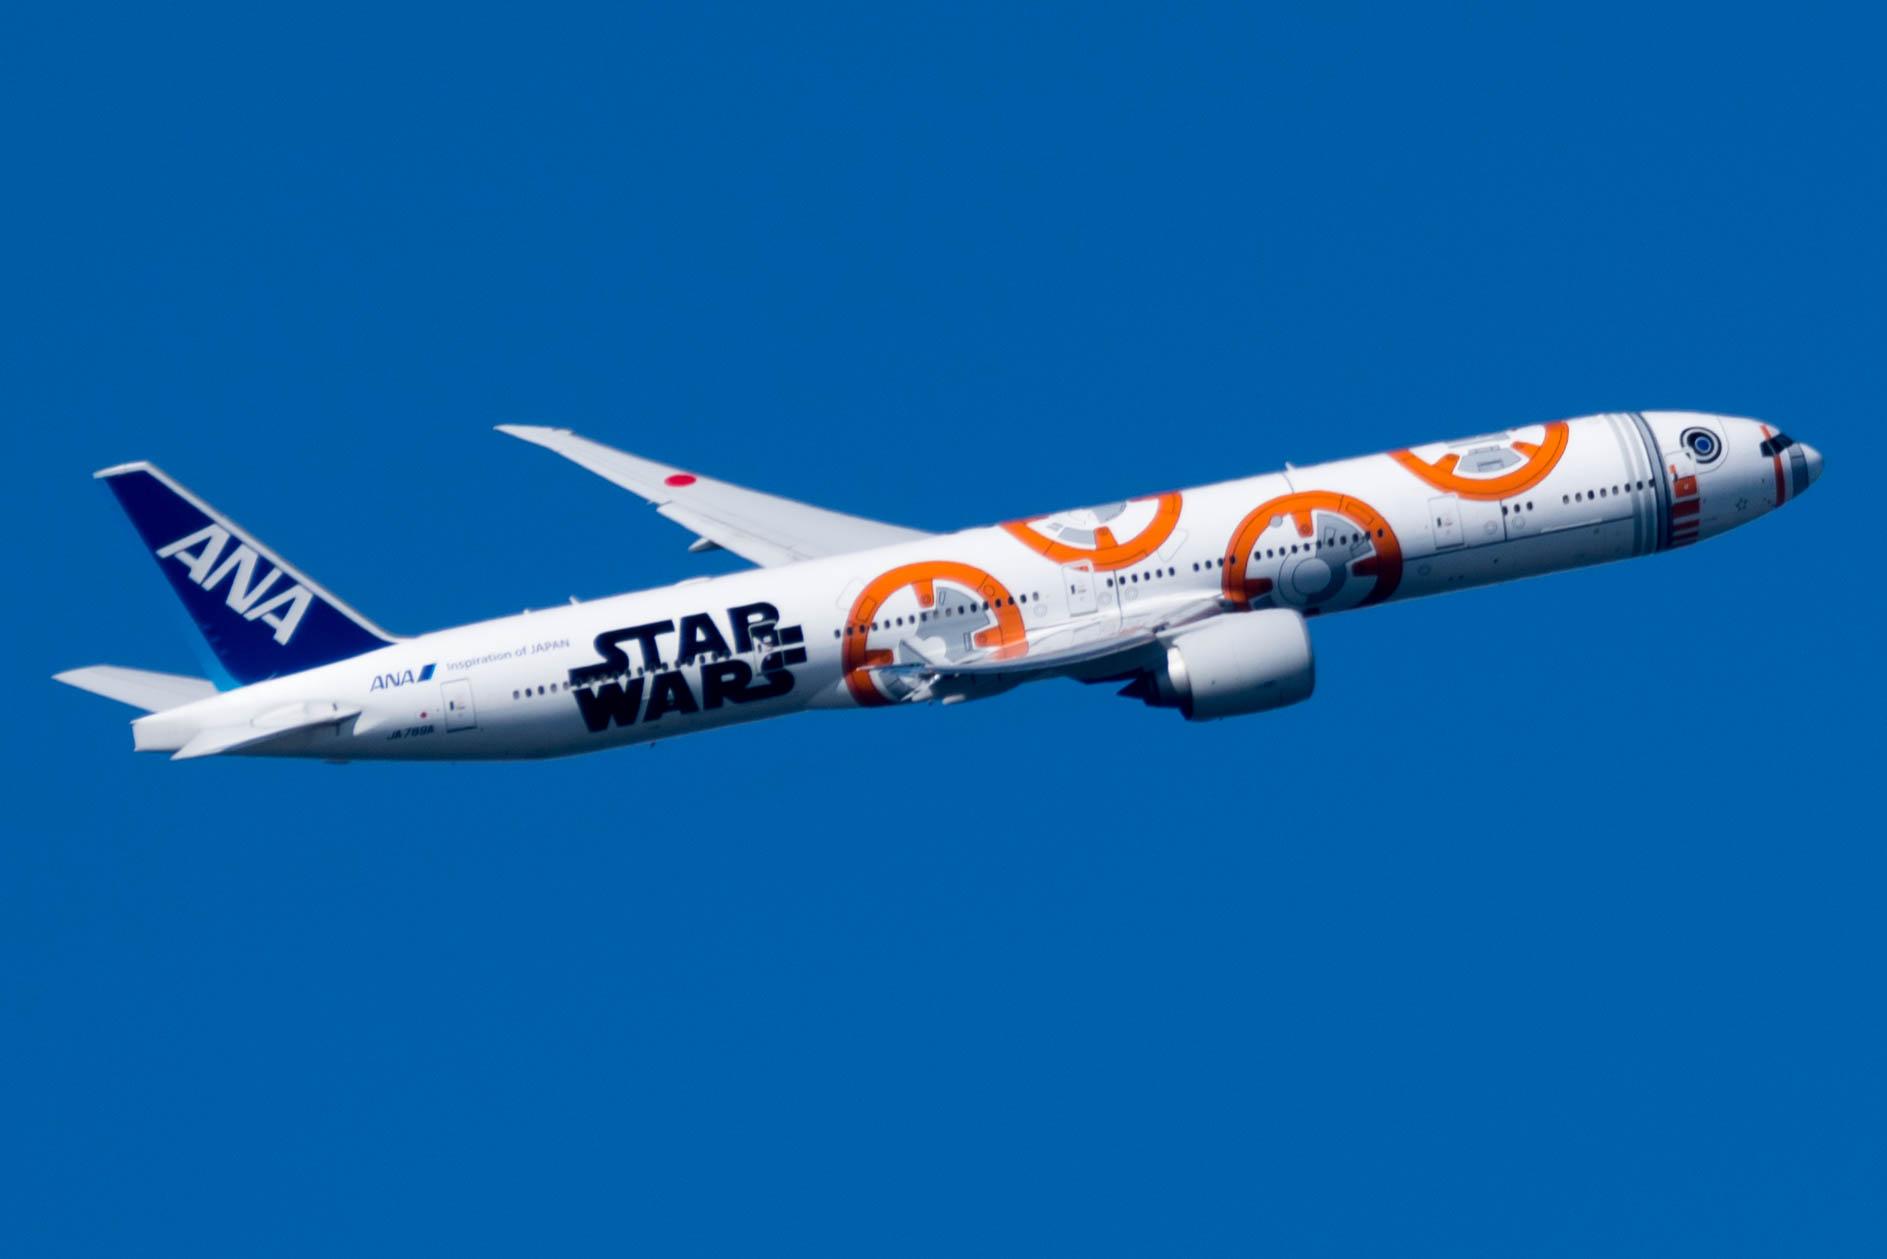 Datei:All Nippon Airways (Star Wars BB-8 livery) Boeing 777 (JA789A) at  Tokyo Haneda Airport.jpg – Wikipedia